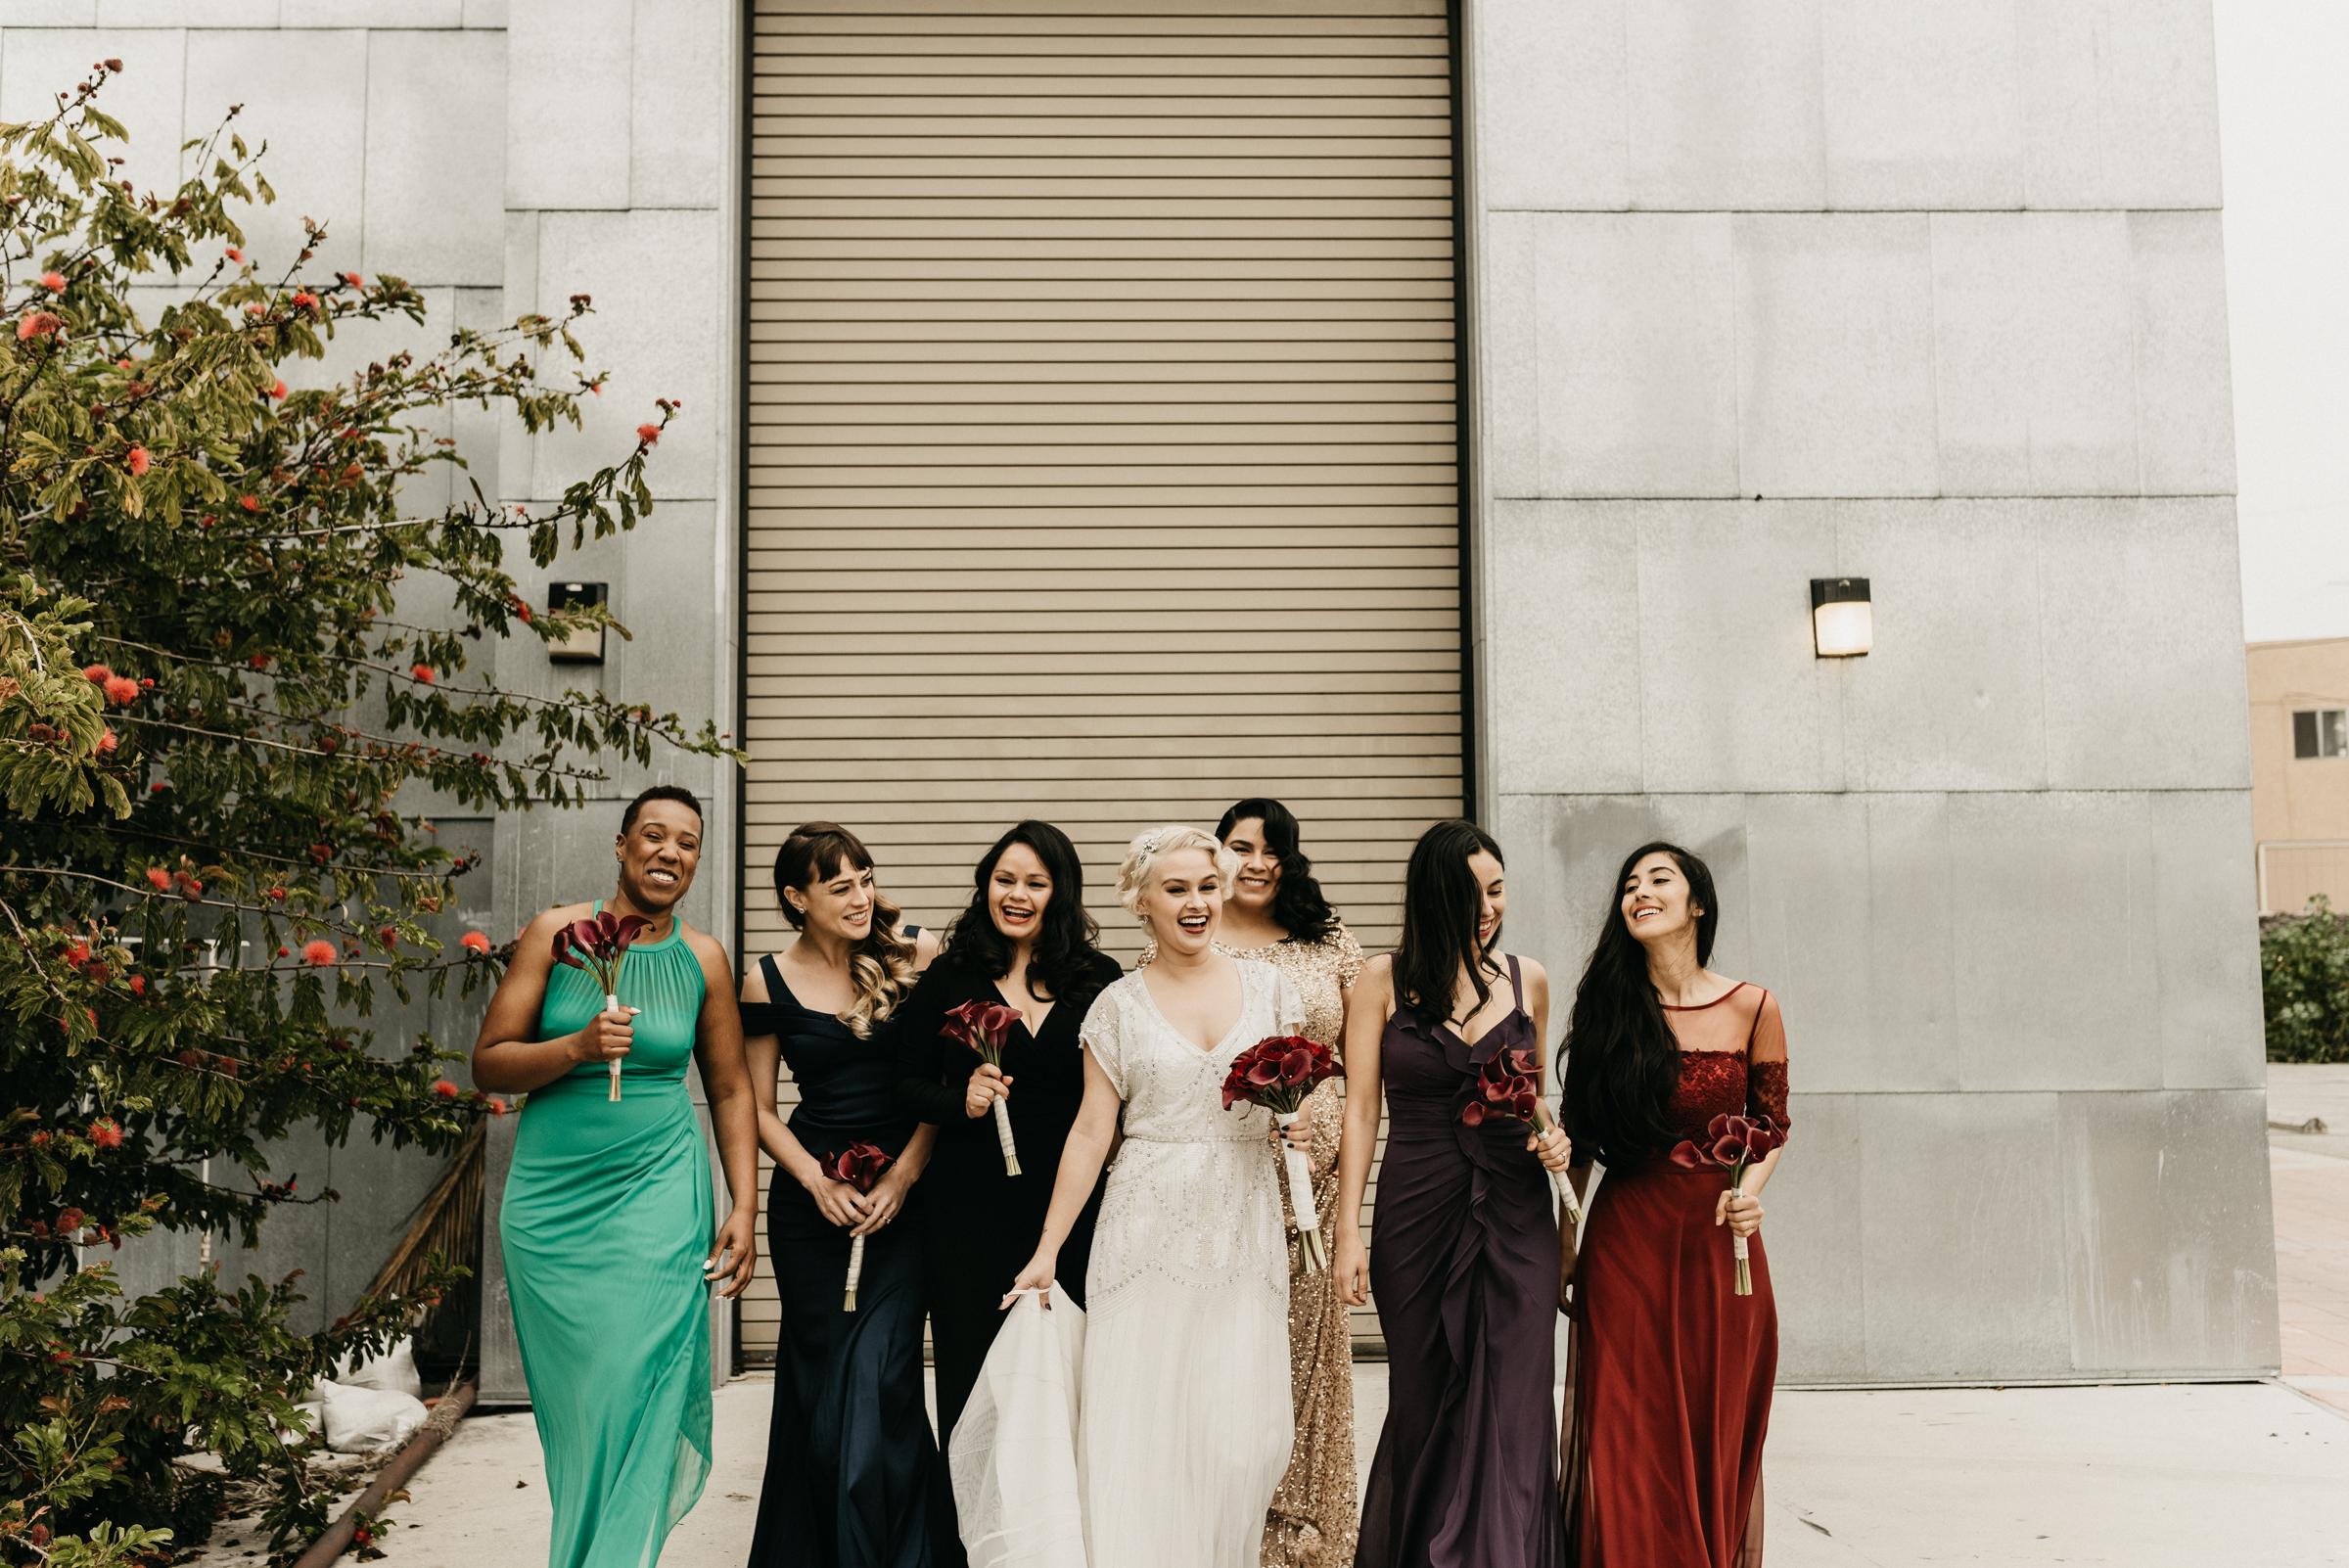 ©Isaiah + Taylor Photography - Studio 11 Wedding, Los Angeles Wedding Photographer-32.jpg